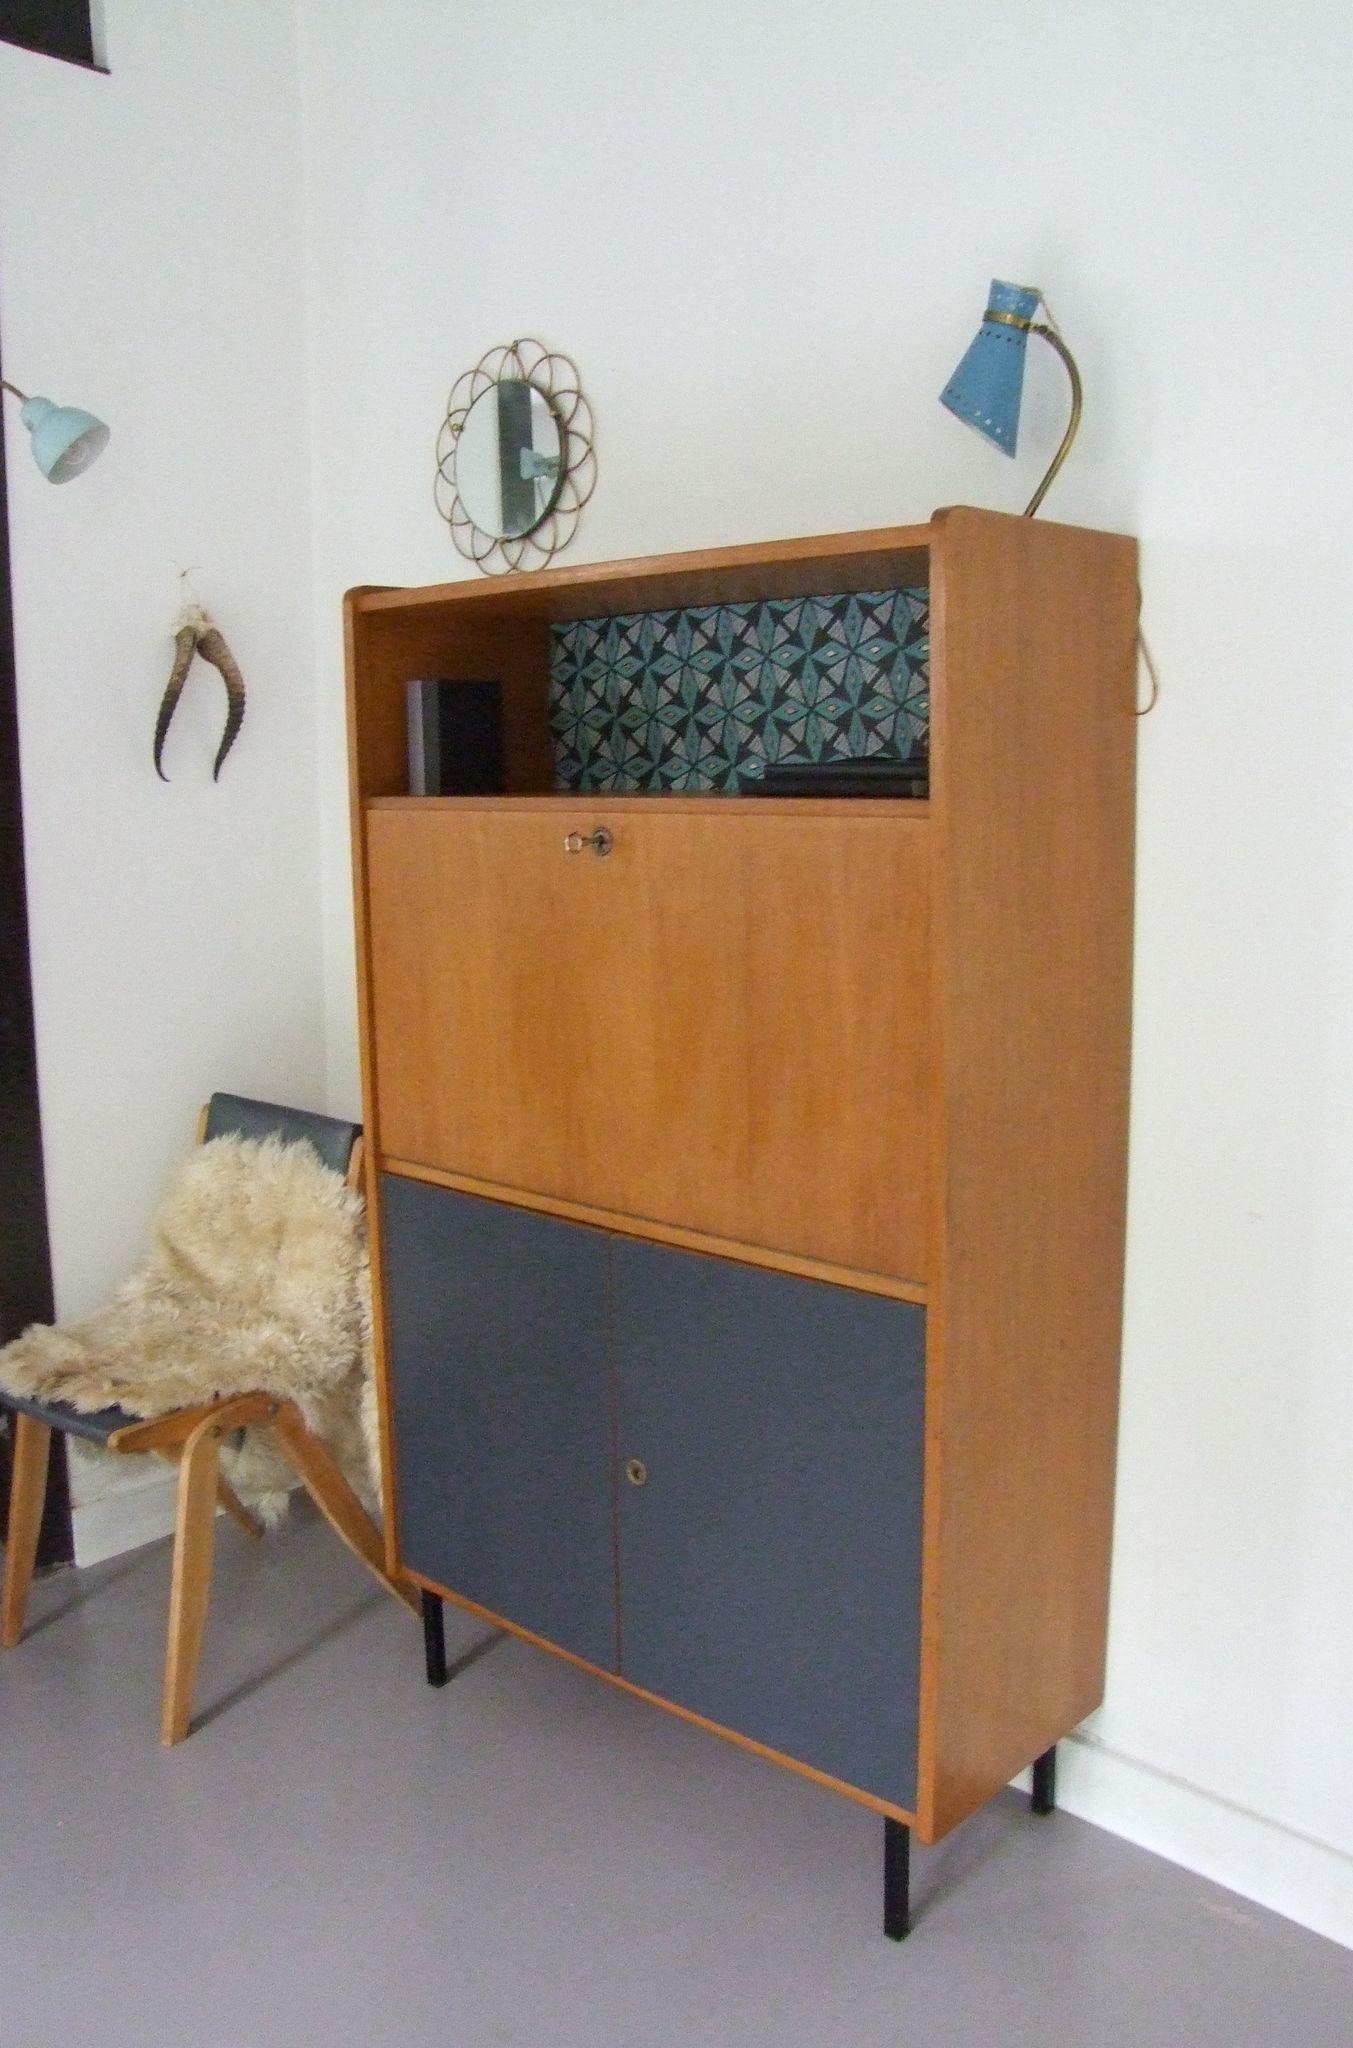 afficher l 39 image d 39 origine secretaire meuble vintage. Black Bedroom Furniture Sets. Home Design Ideas